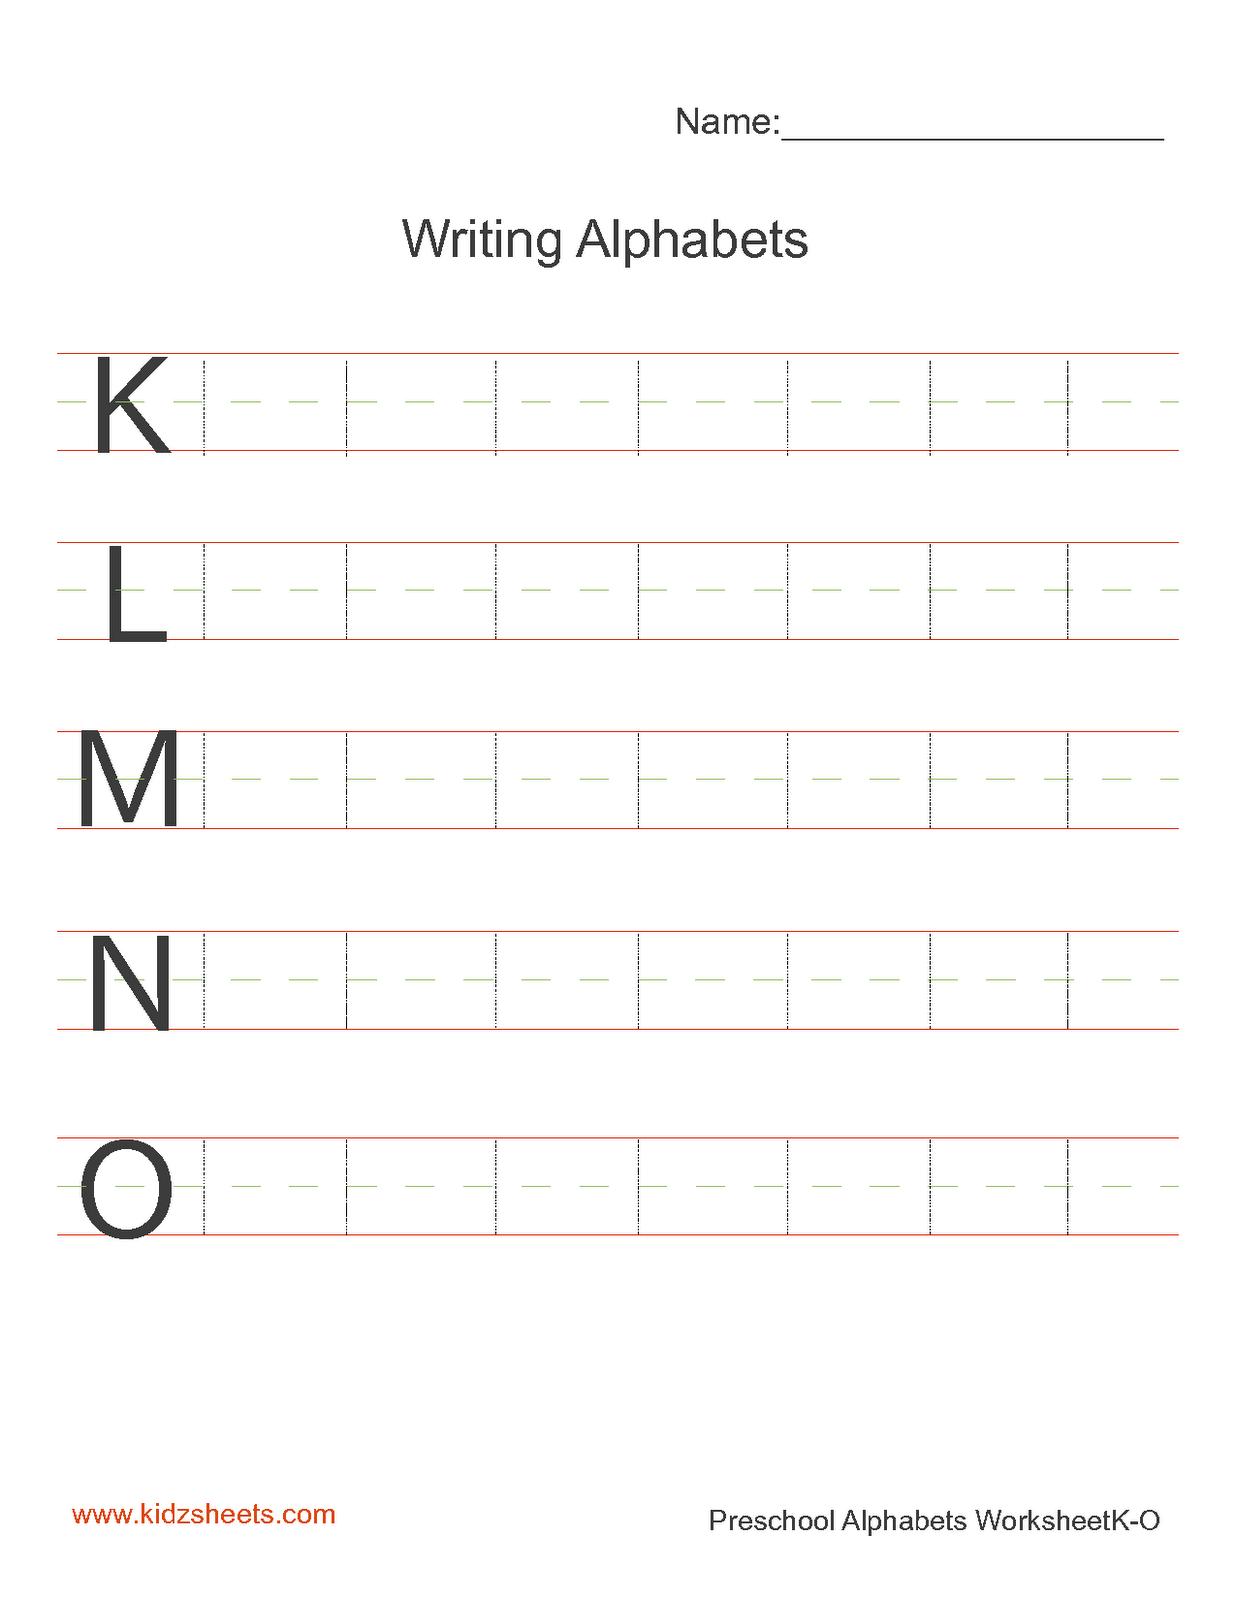 Kidz Worksheets Preschool Writing Alphabets Worksheet3